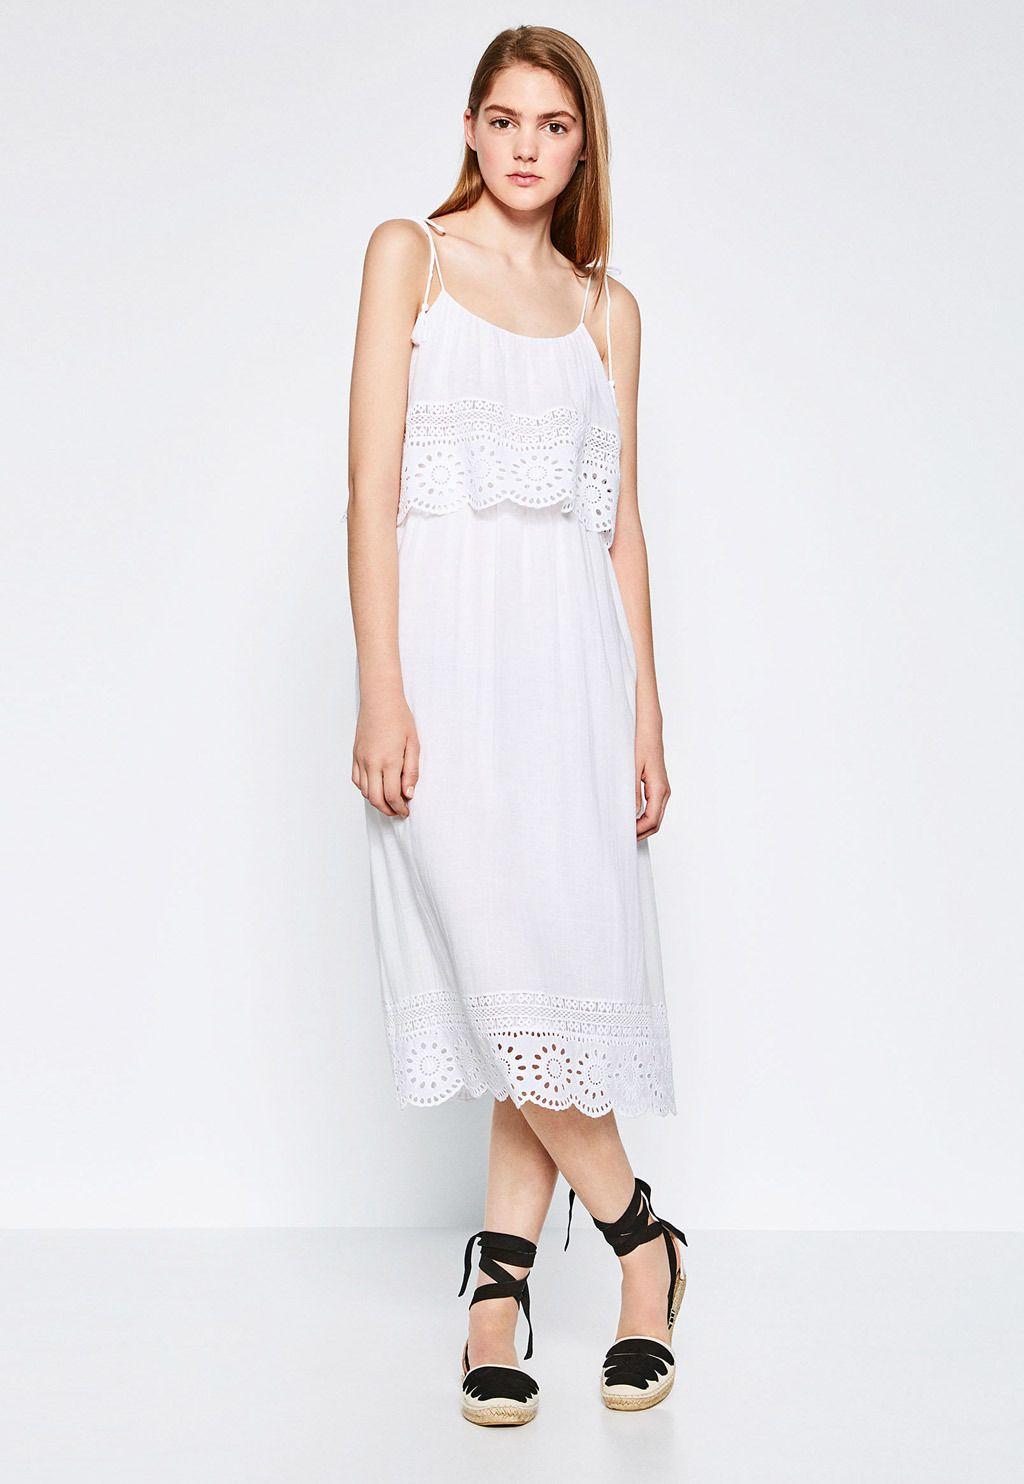 Zara Vestidos Online Vestidos Zara Formales Online Blancos Blancos j5RL4A